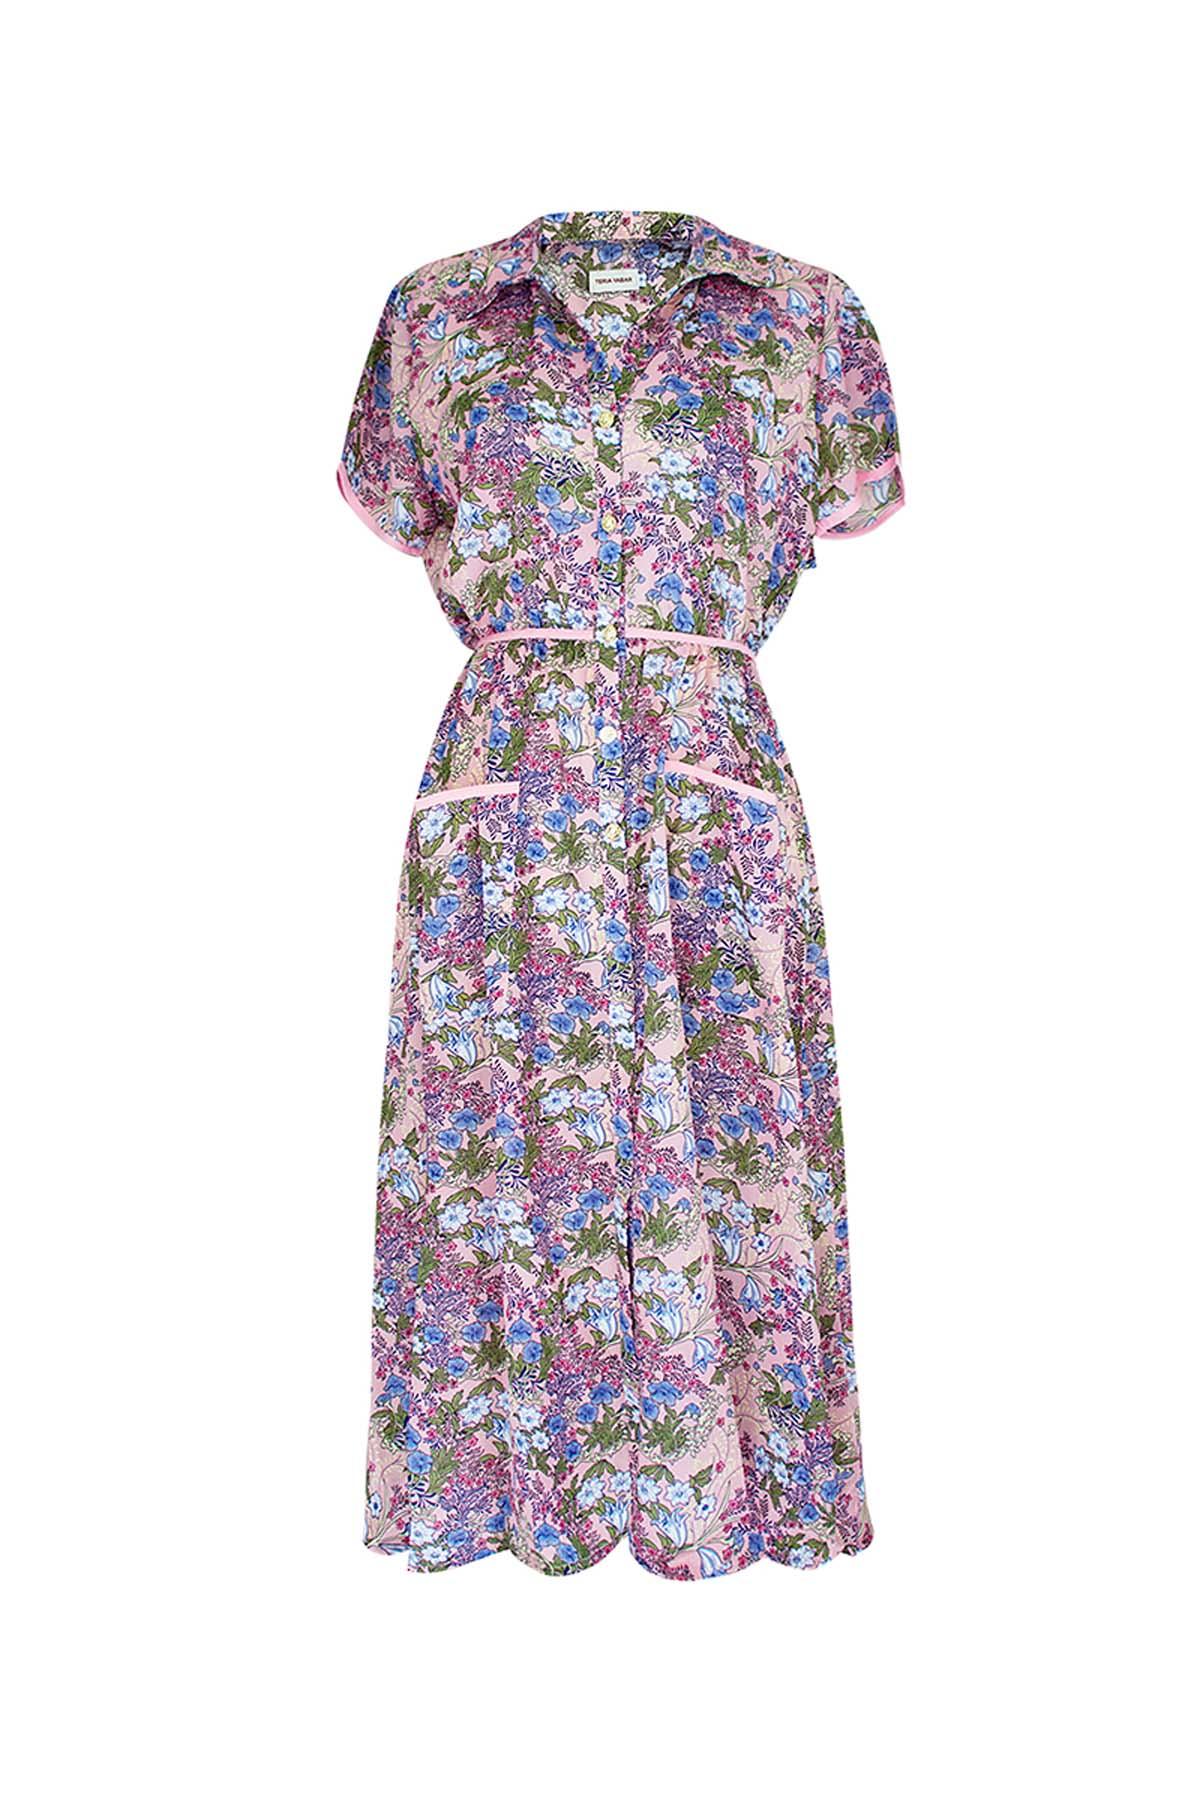 Teria Yabar - Vestido tea dress pink